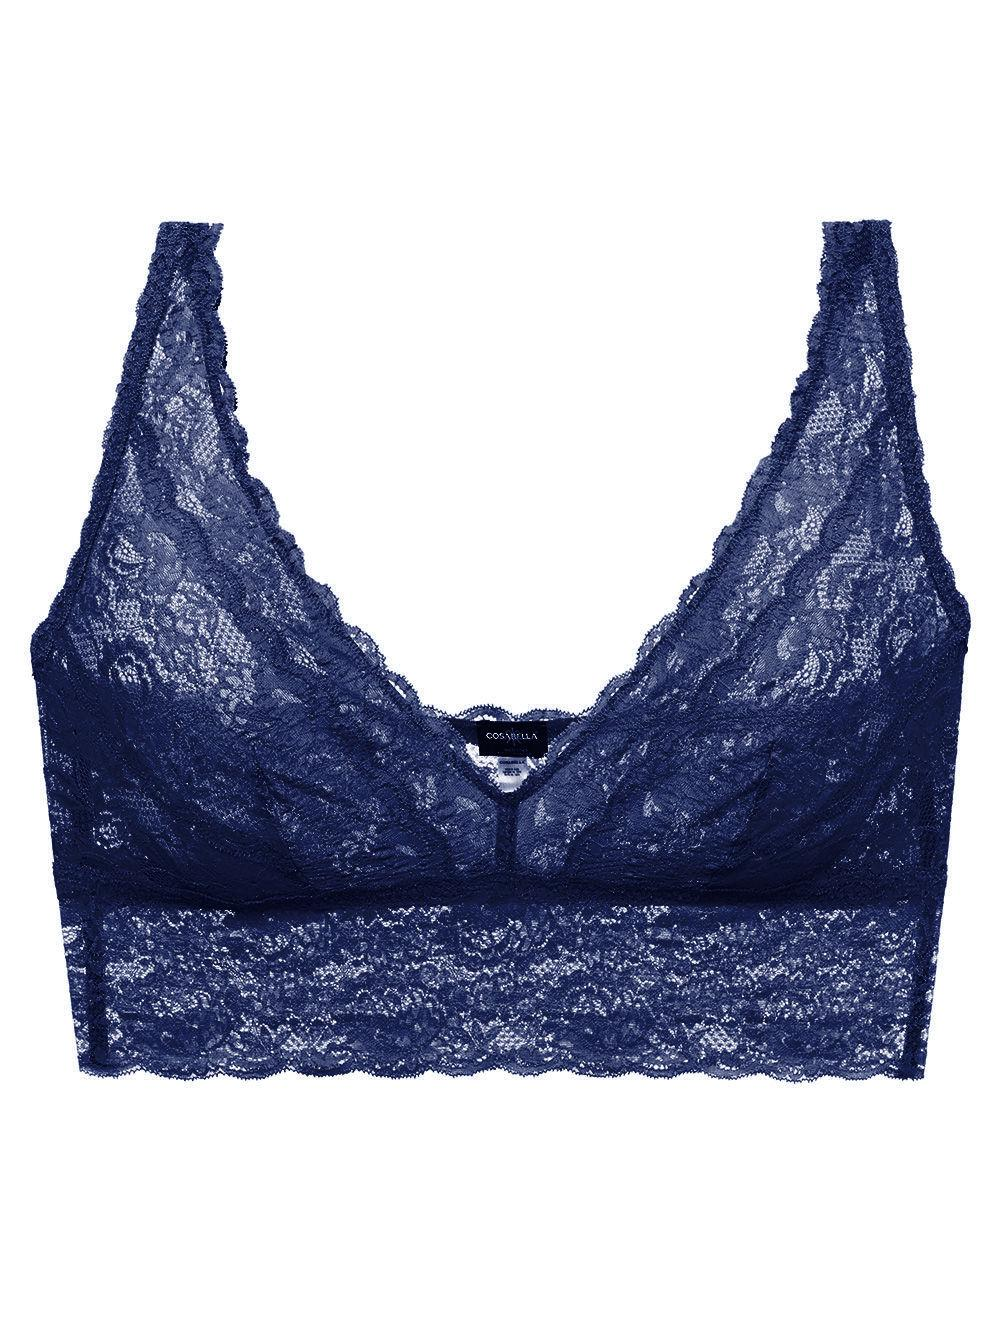 aaf3defa2b Lyst - Cosabella Never Say Never Plungie Longline Bralette in Blue